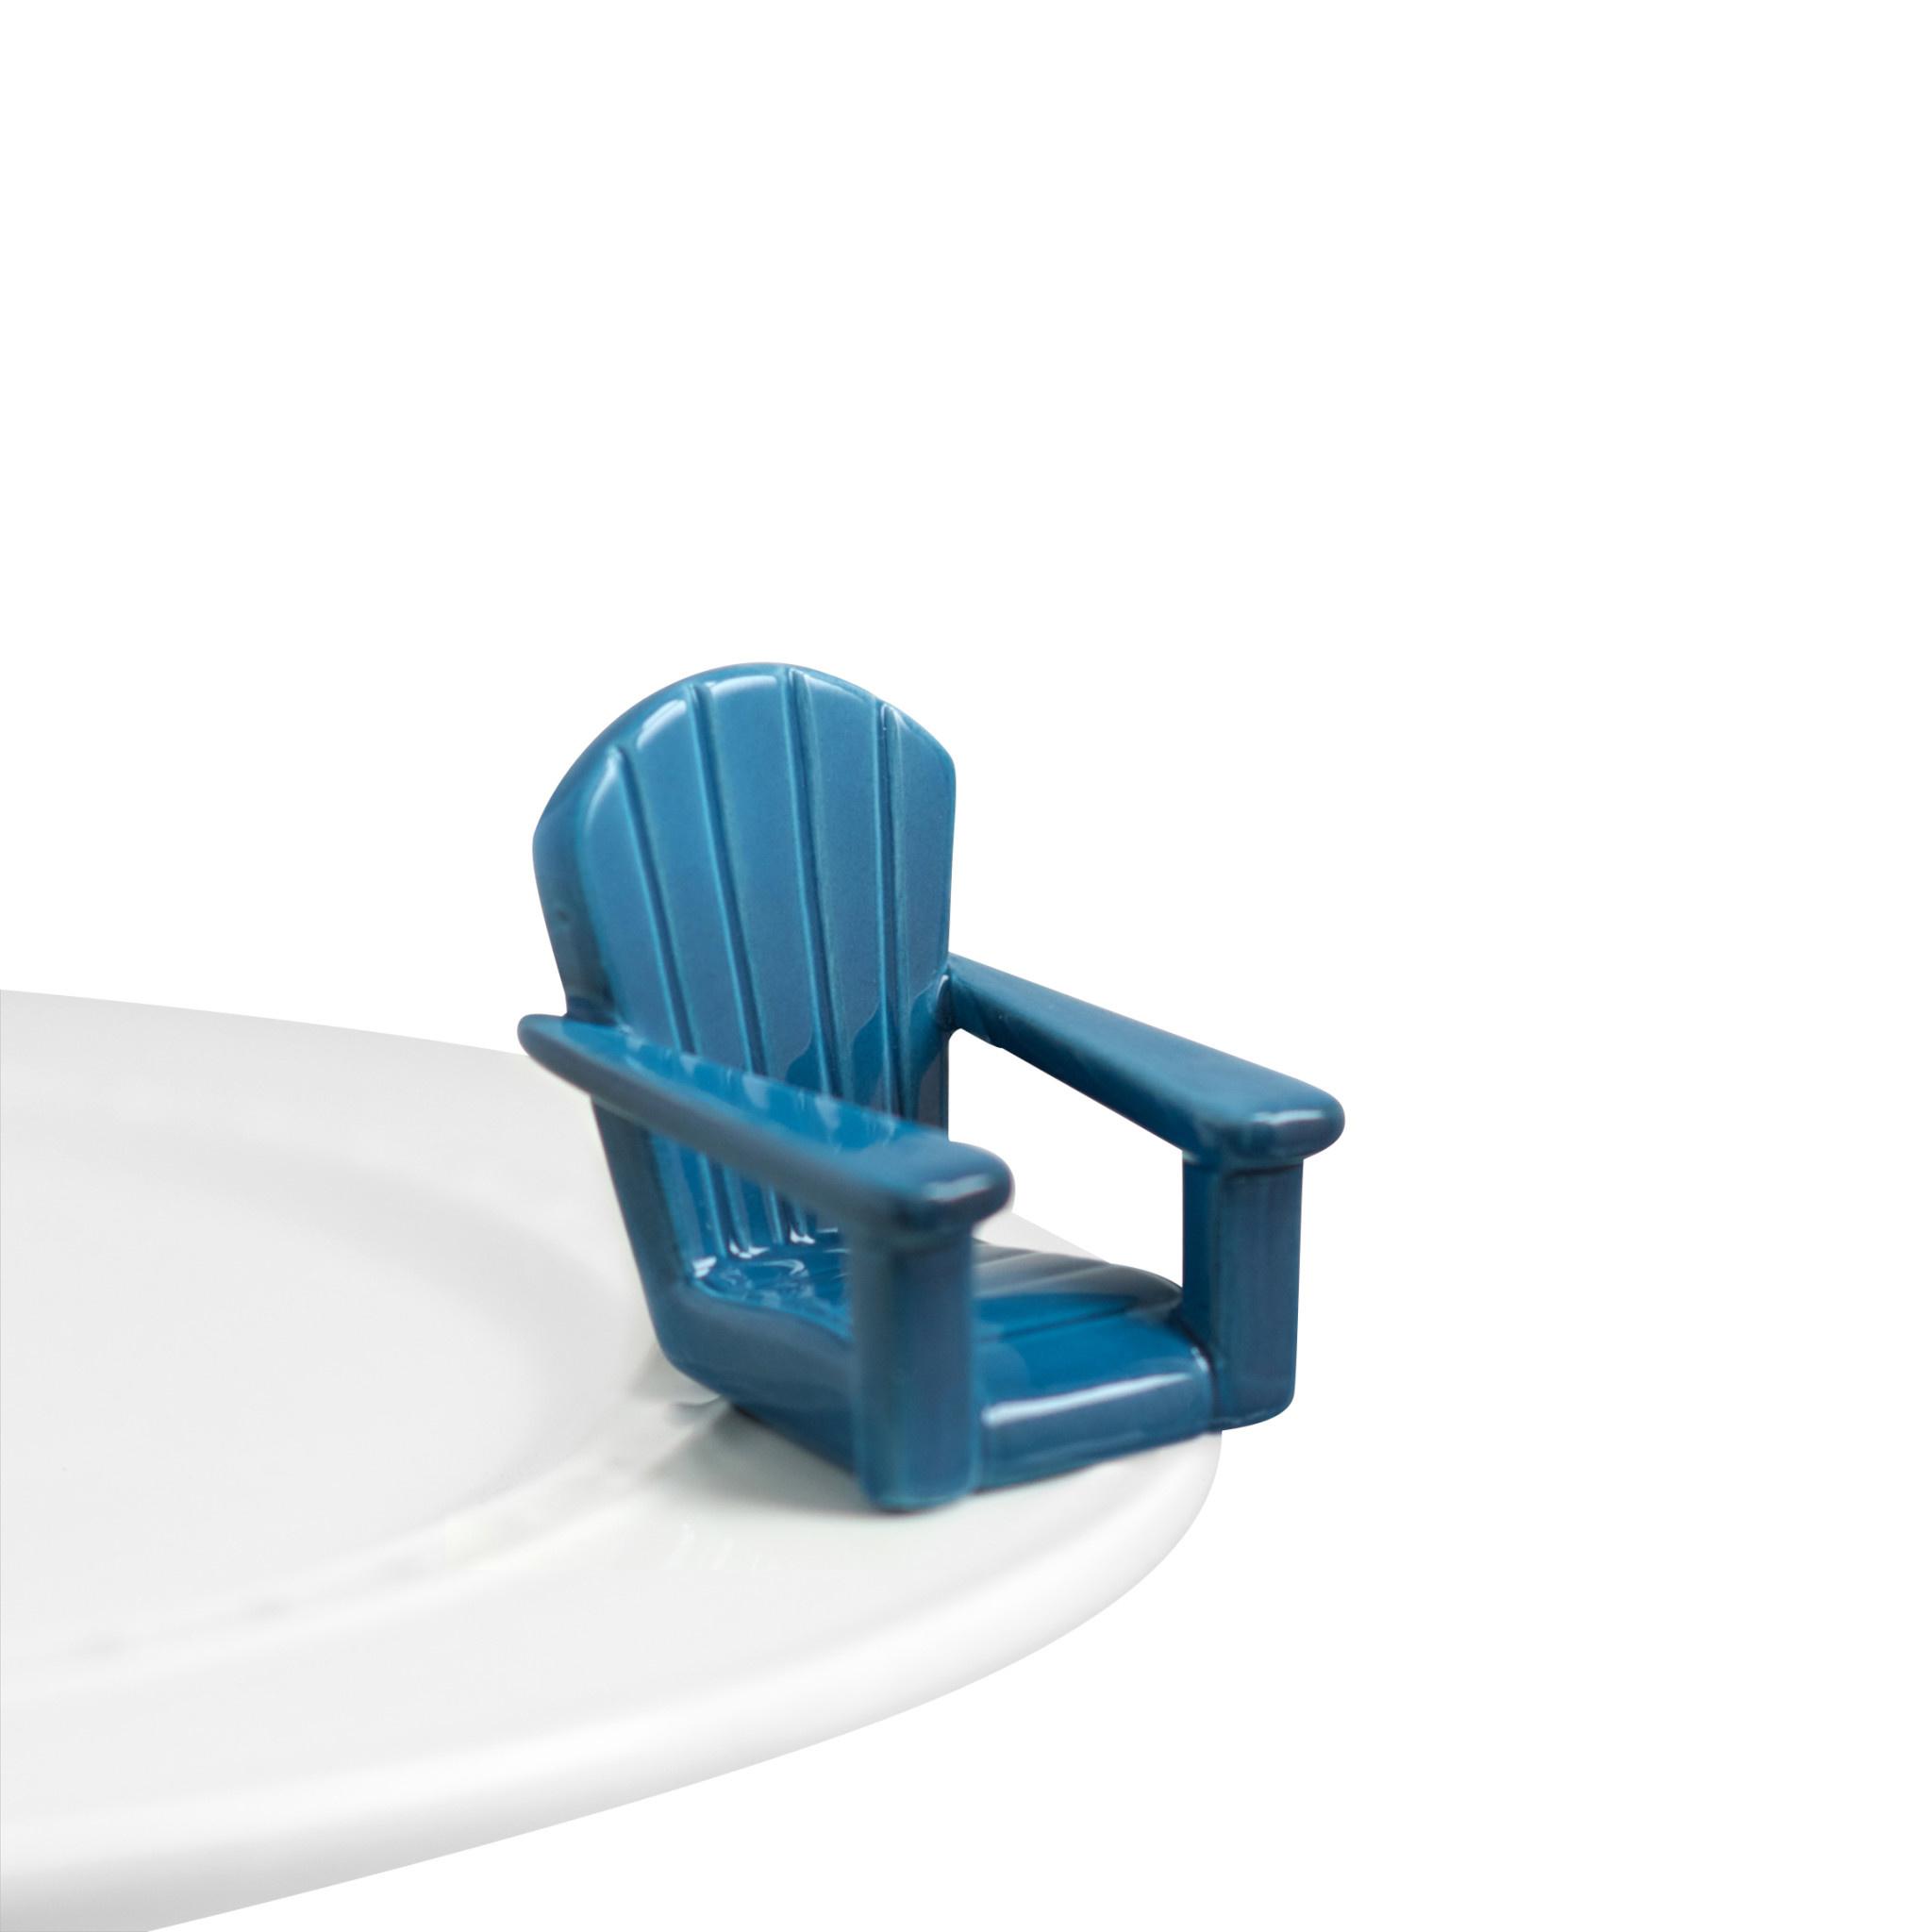 nora fleming chillin' chair blue mini (adirondack)